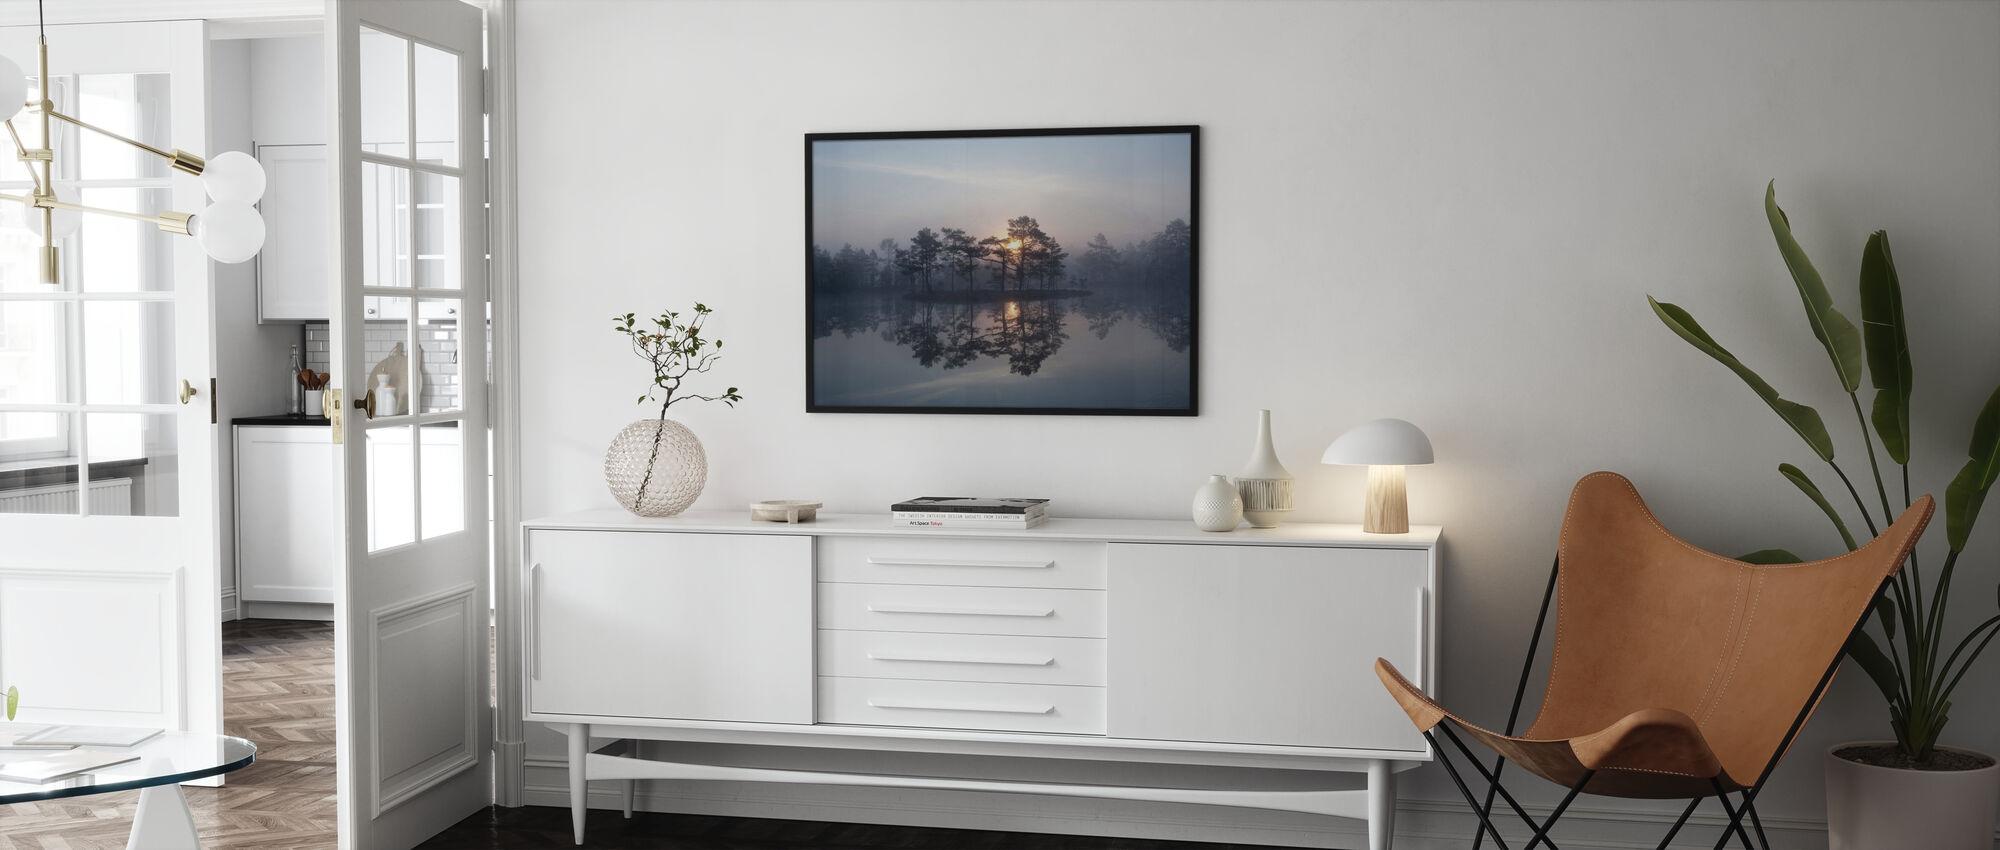 Betoverende mist - Ingelijste print - Woonkamer